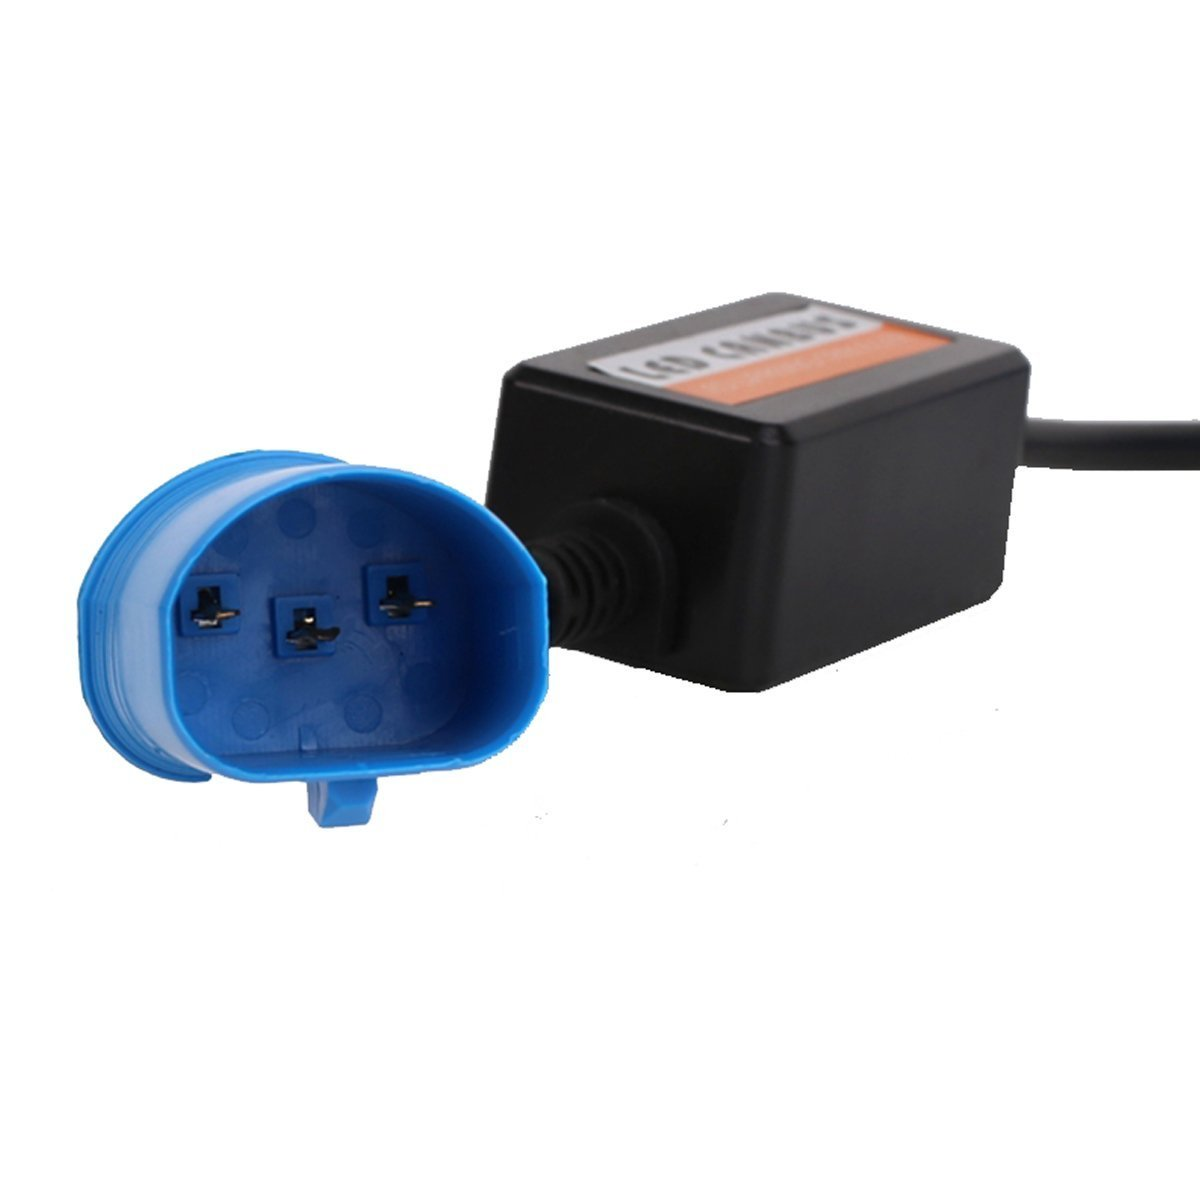 Black, 2pcs Lightronic H8//H11//H9//H16 led canbus Error Free Decoder Canceller Capacitor Anti-Flicker Resistor Harness for LED Headlight